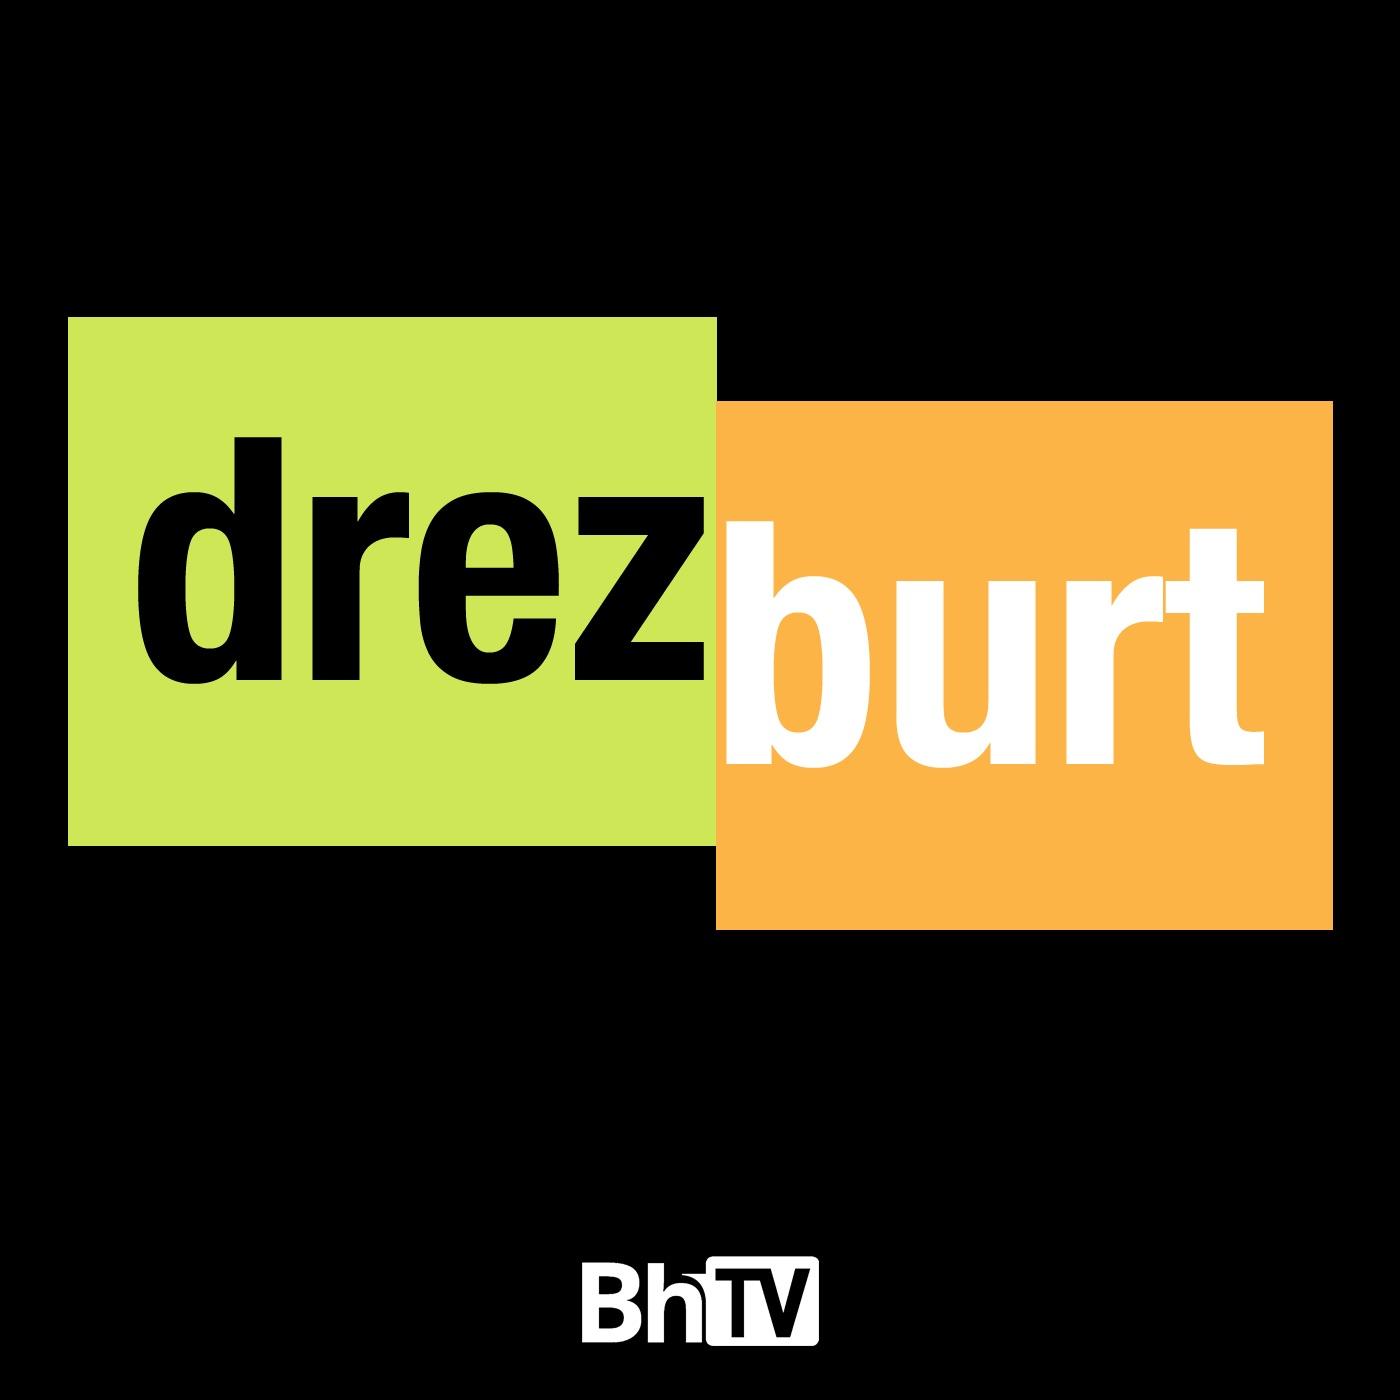 BhTV: Drezburt (fast)